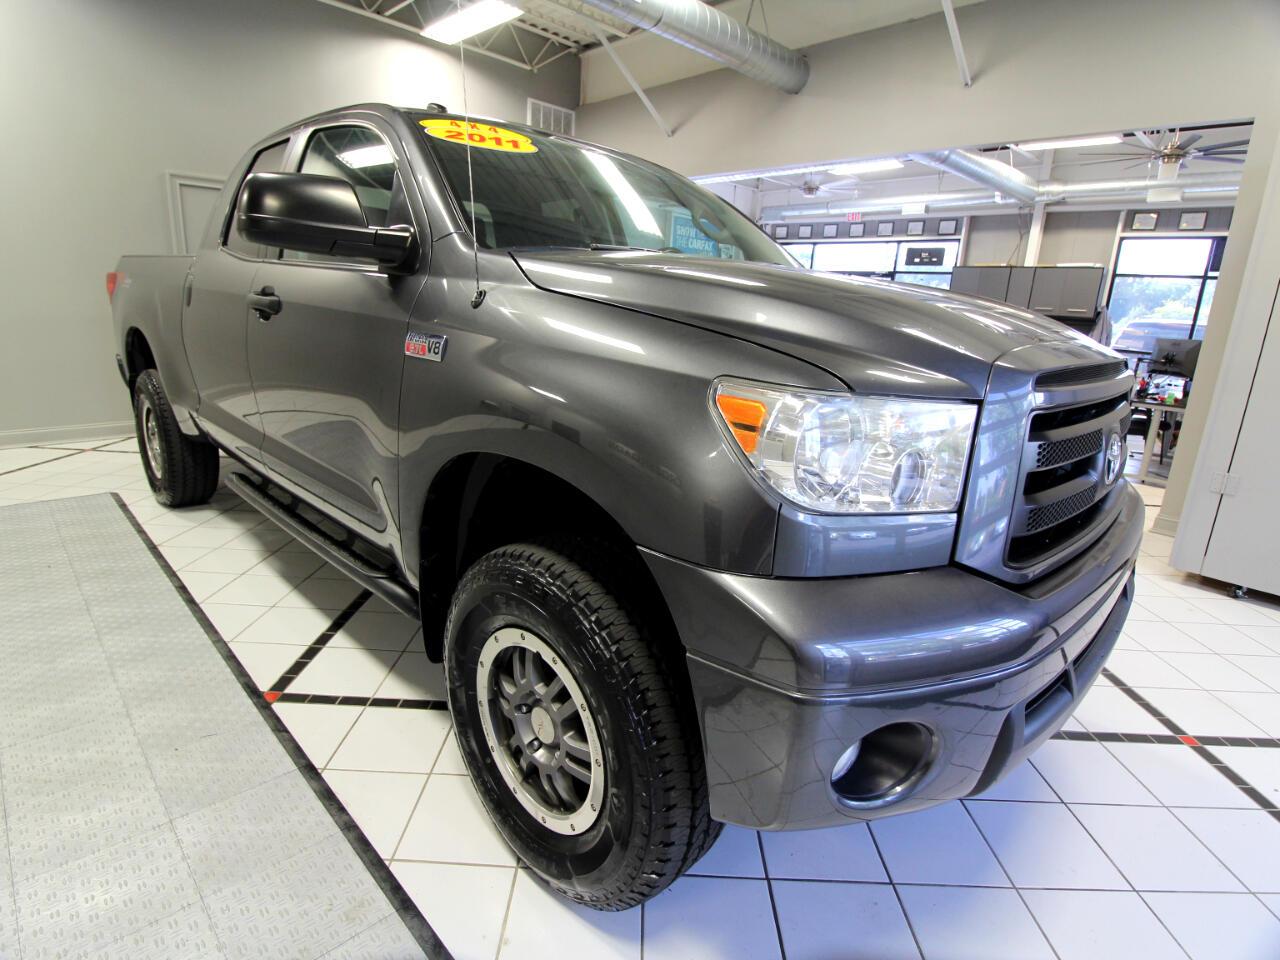 2011 Toyota Tundra 4WD Truck Double Cab 5.7L FFV V8 6-Spd AT TRD Pro (Natl)